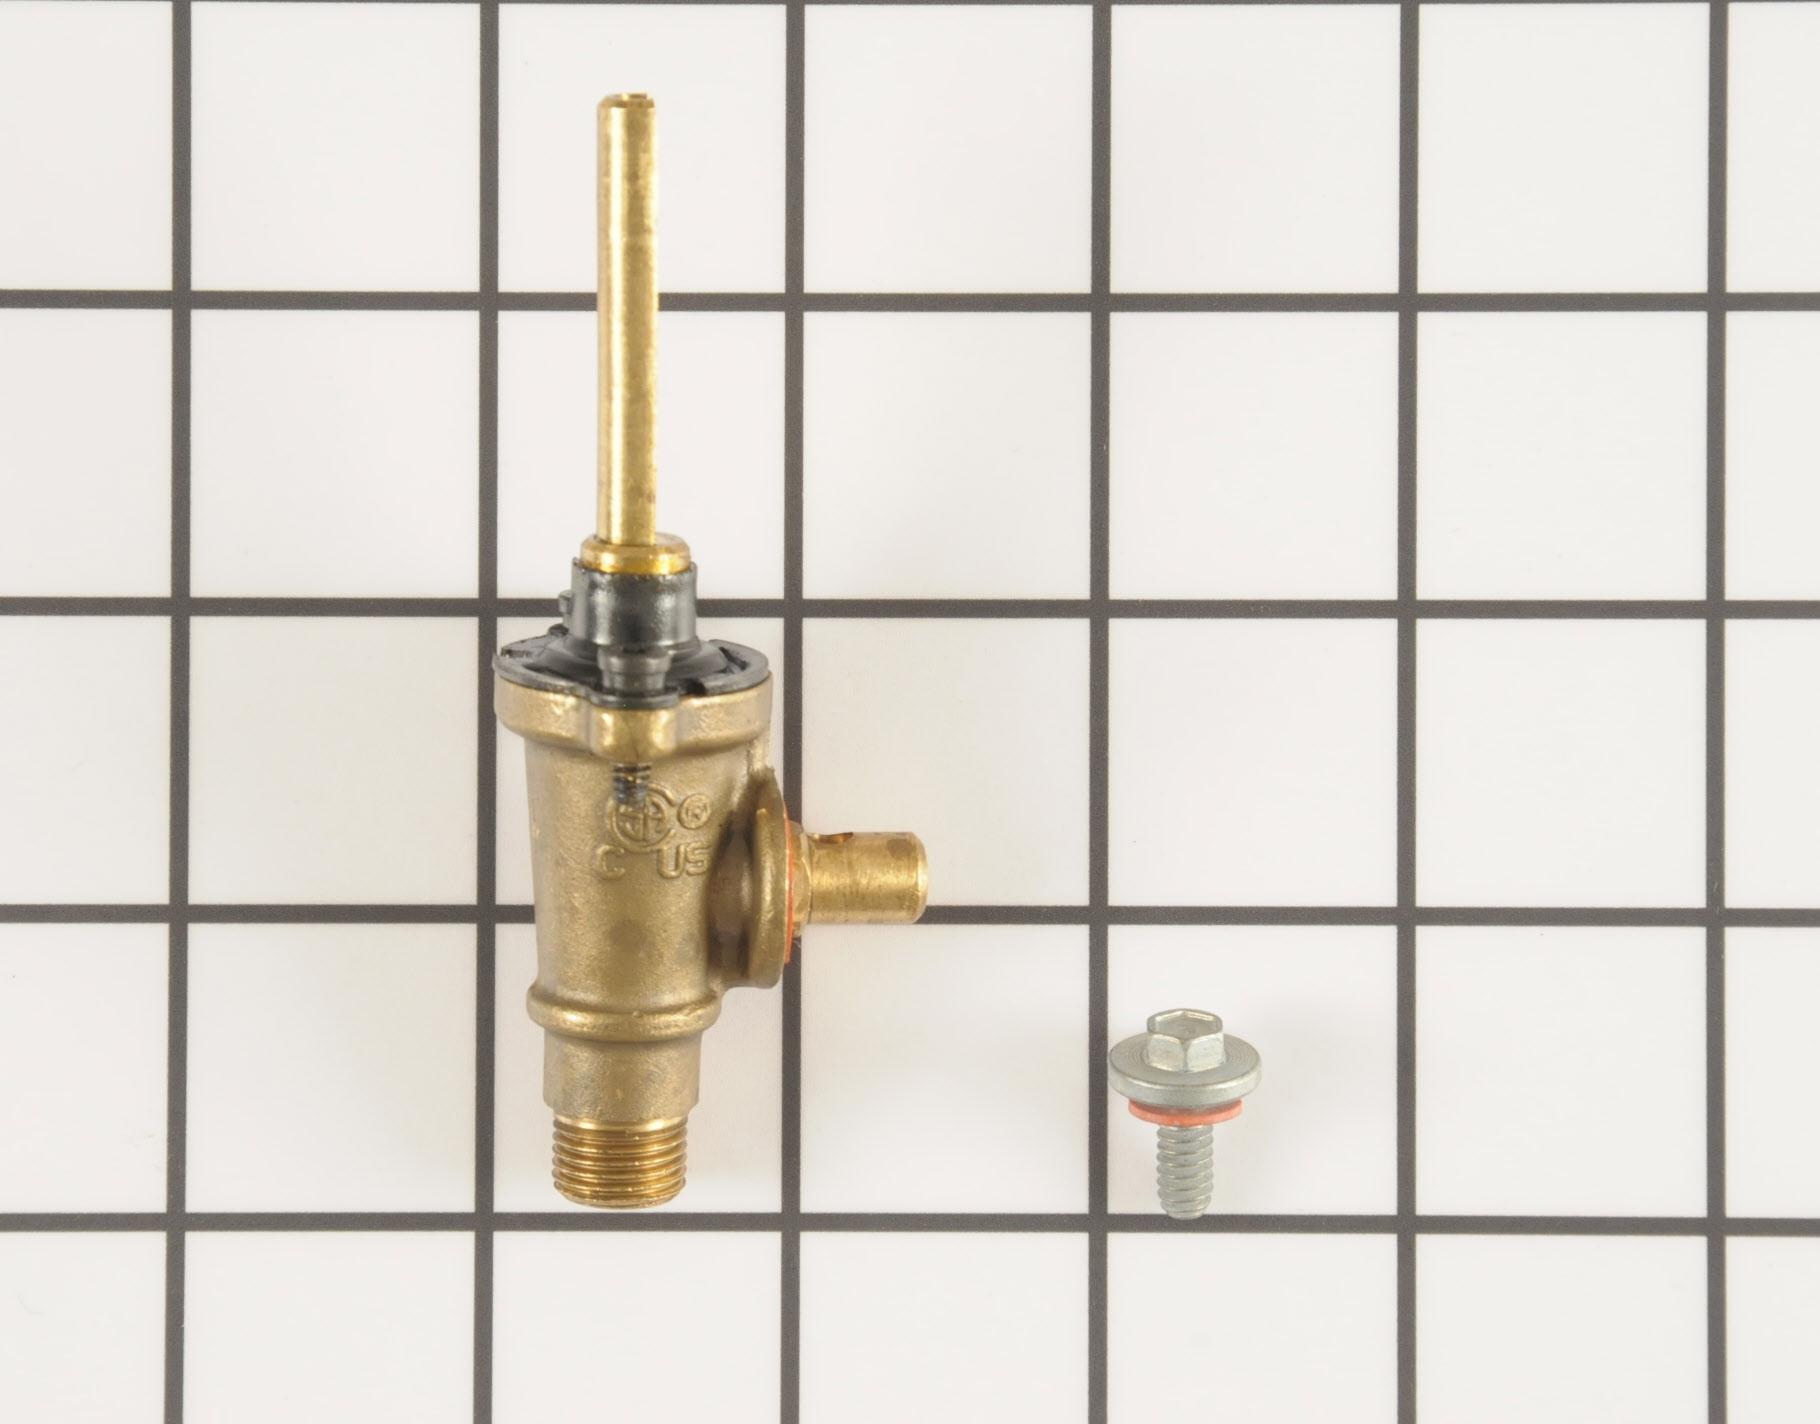 12002276 Crosley Range Stove Oven Part -Surface Burner Valve